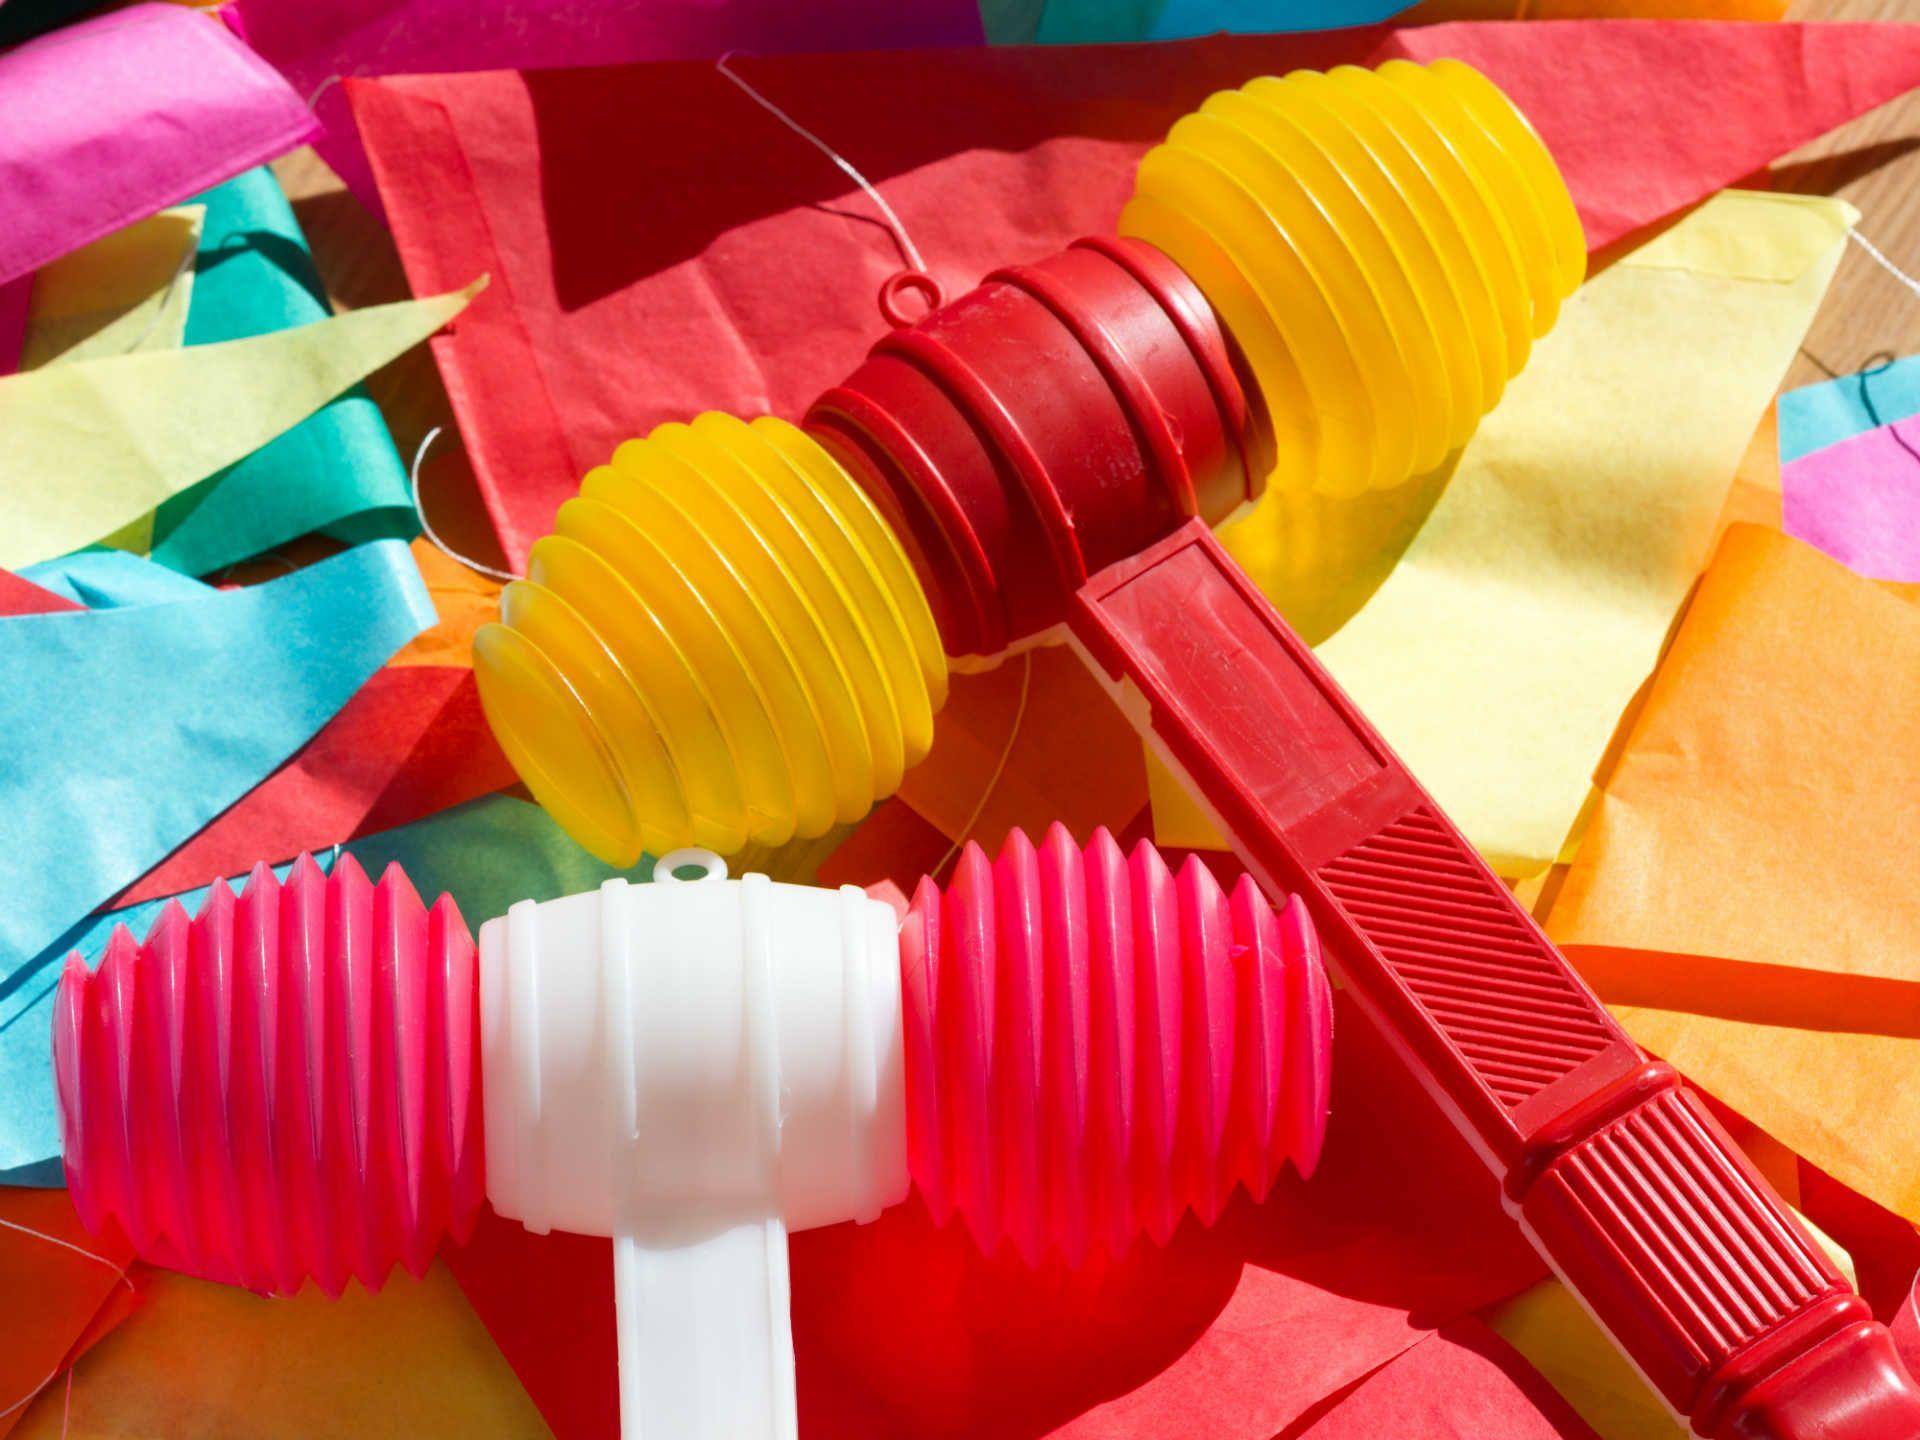 marteau-jouet-en-plastique-porto-portugal-shutterstock_1113511775